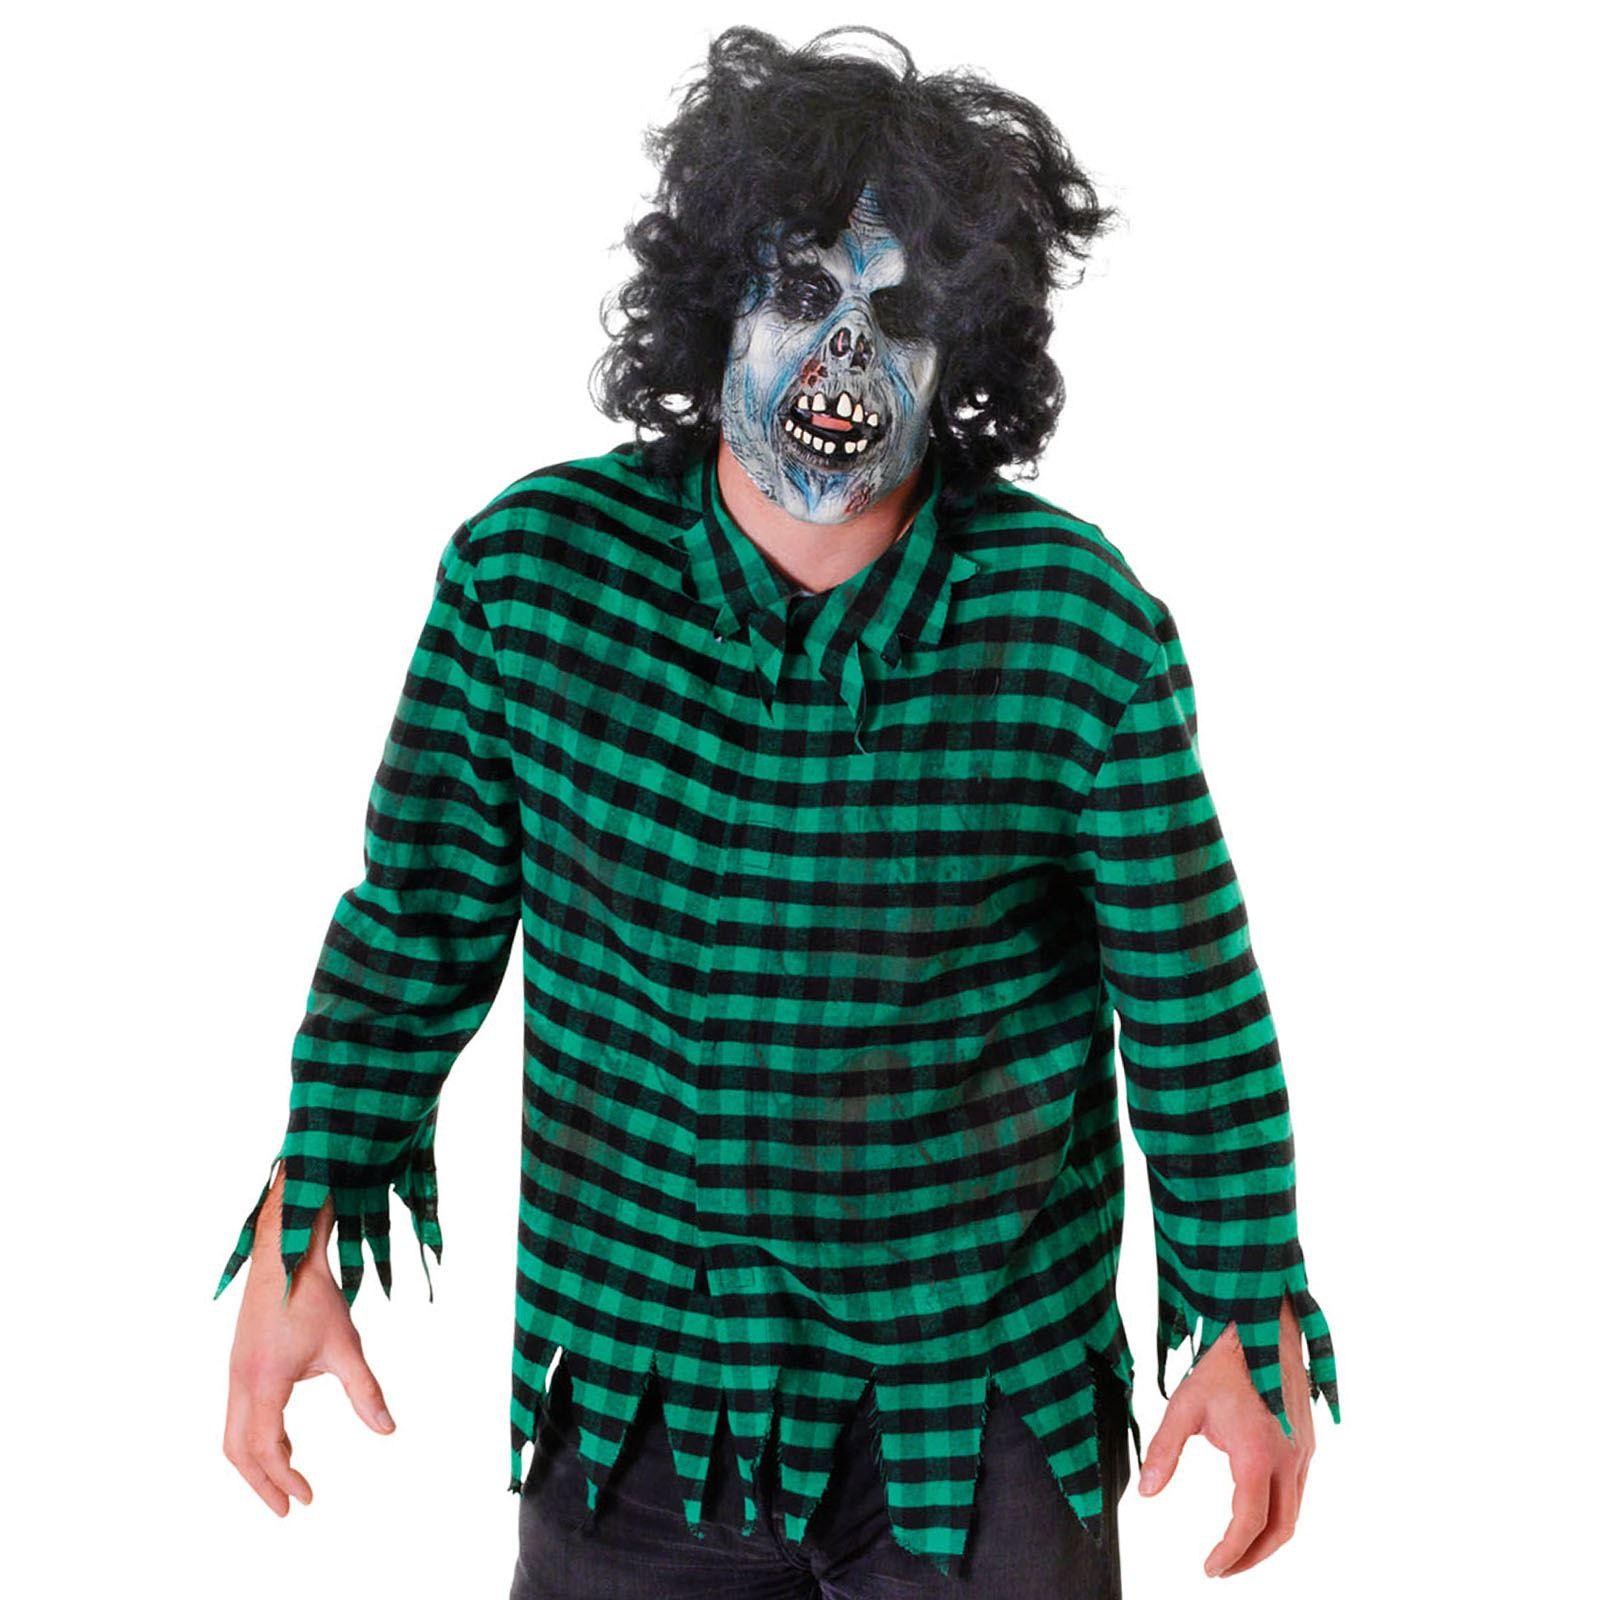 Kids Zombie Momie Perruque Eyptian Halloween Déguisements Halloween Zombie Bandage